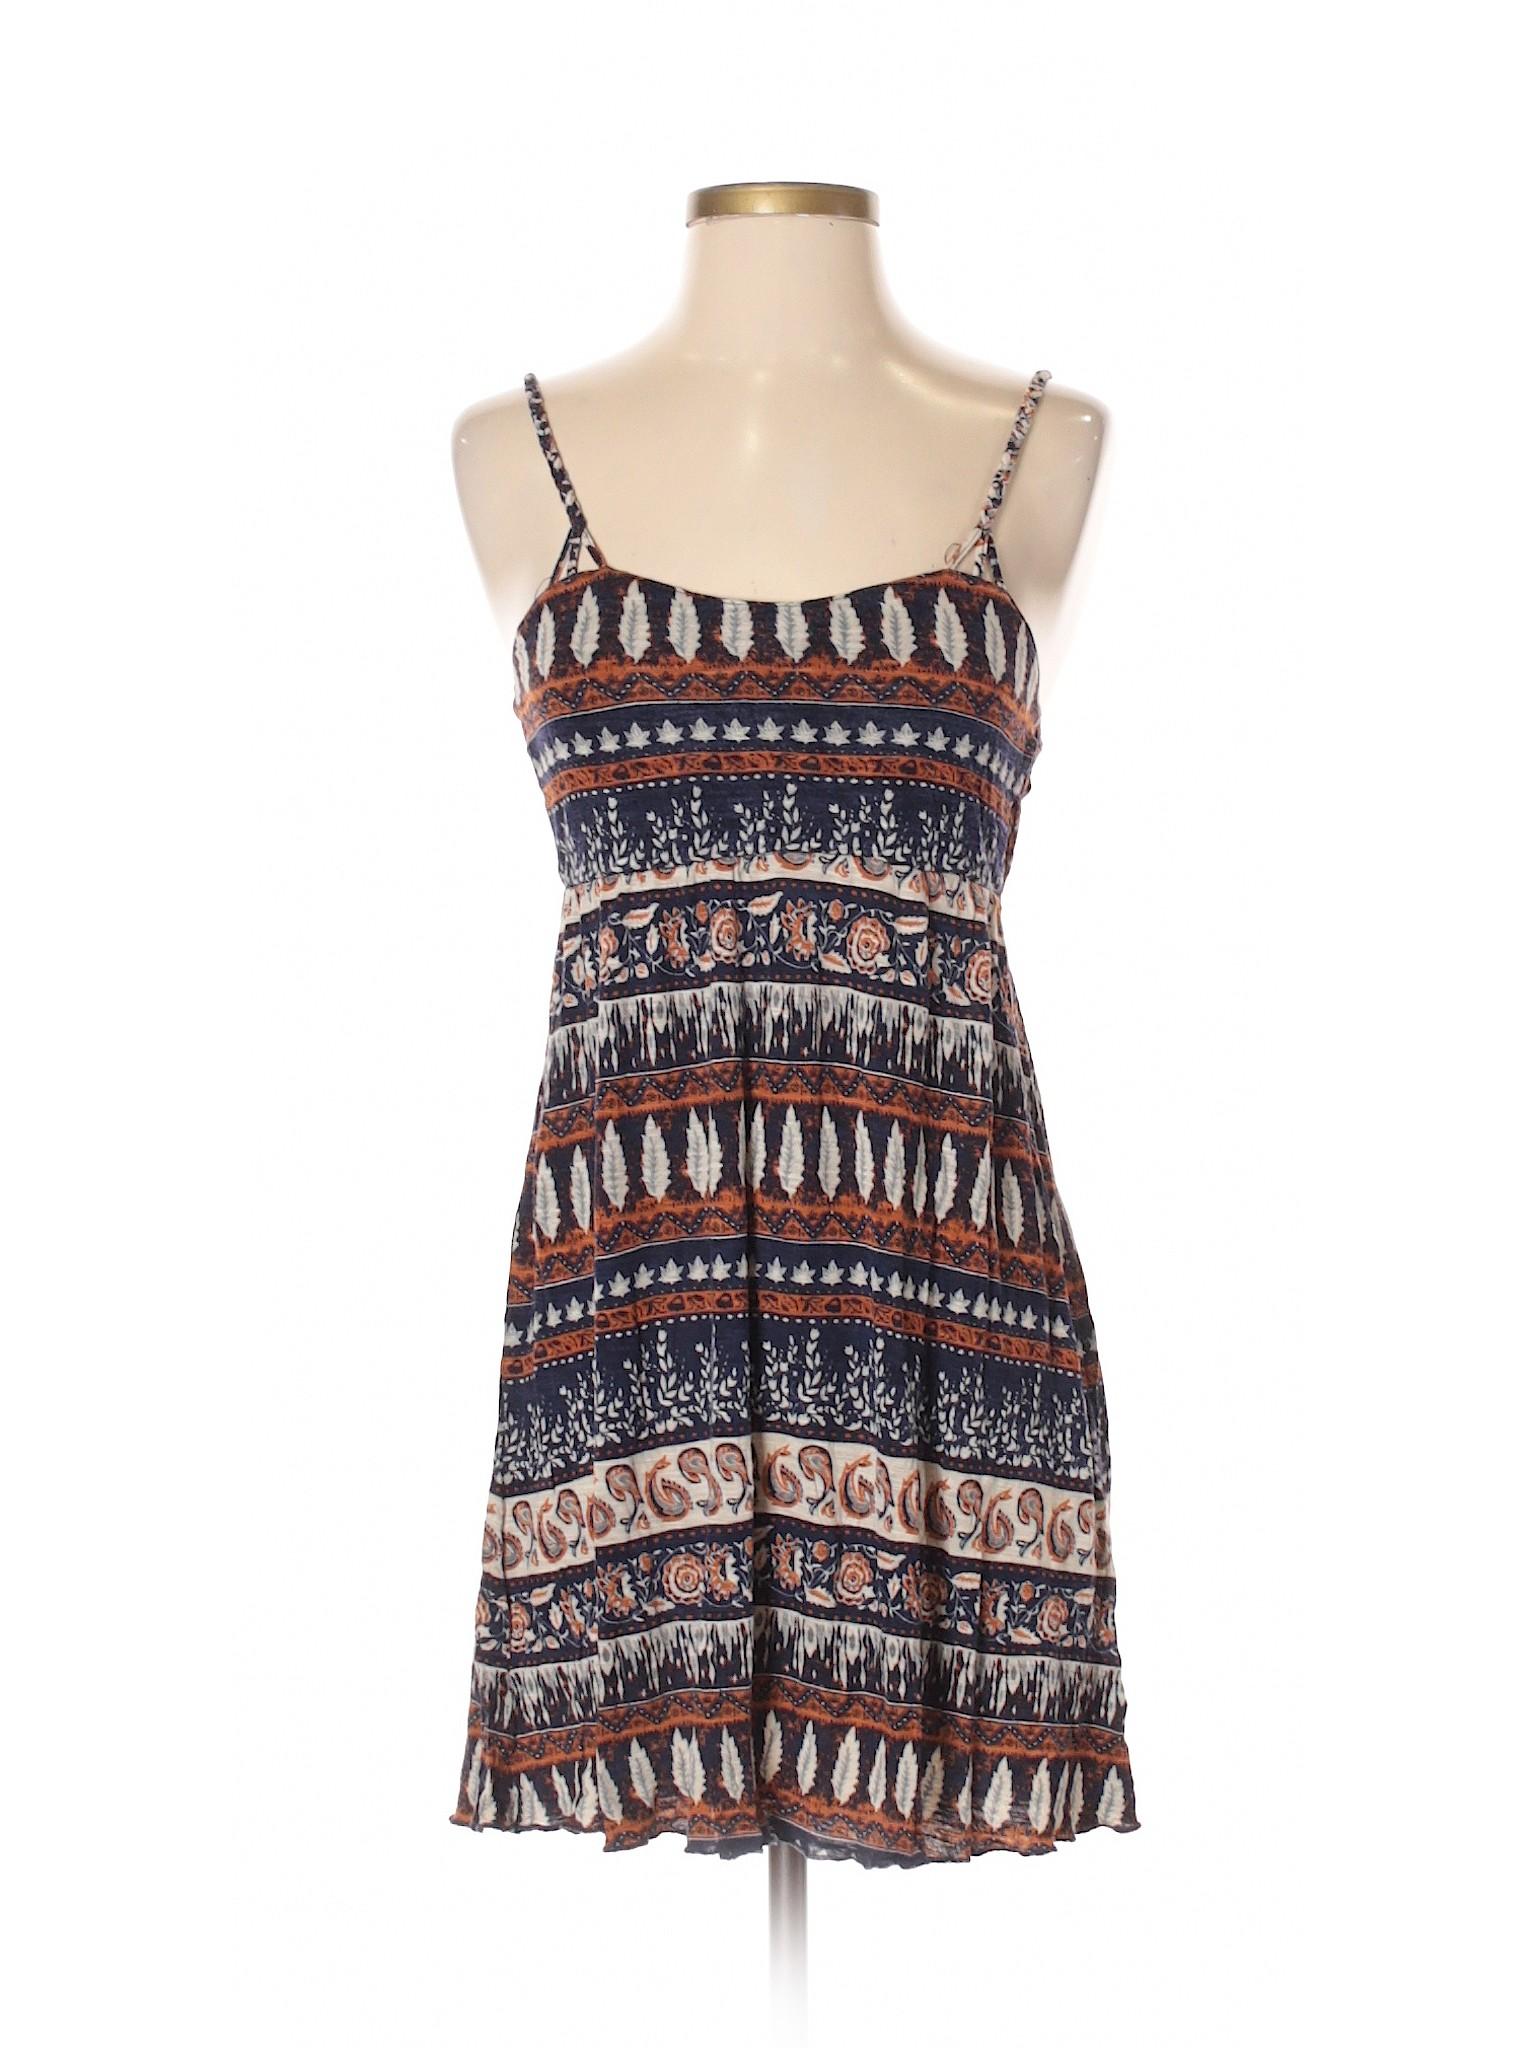 Selling Selling Forever 21 Casual Forever Dress vBZvqa